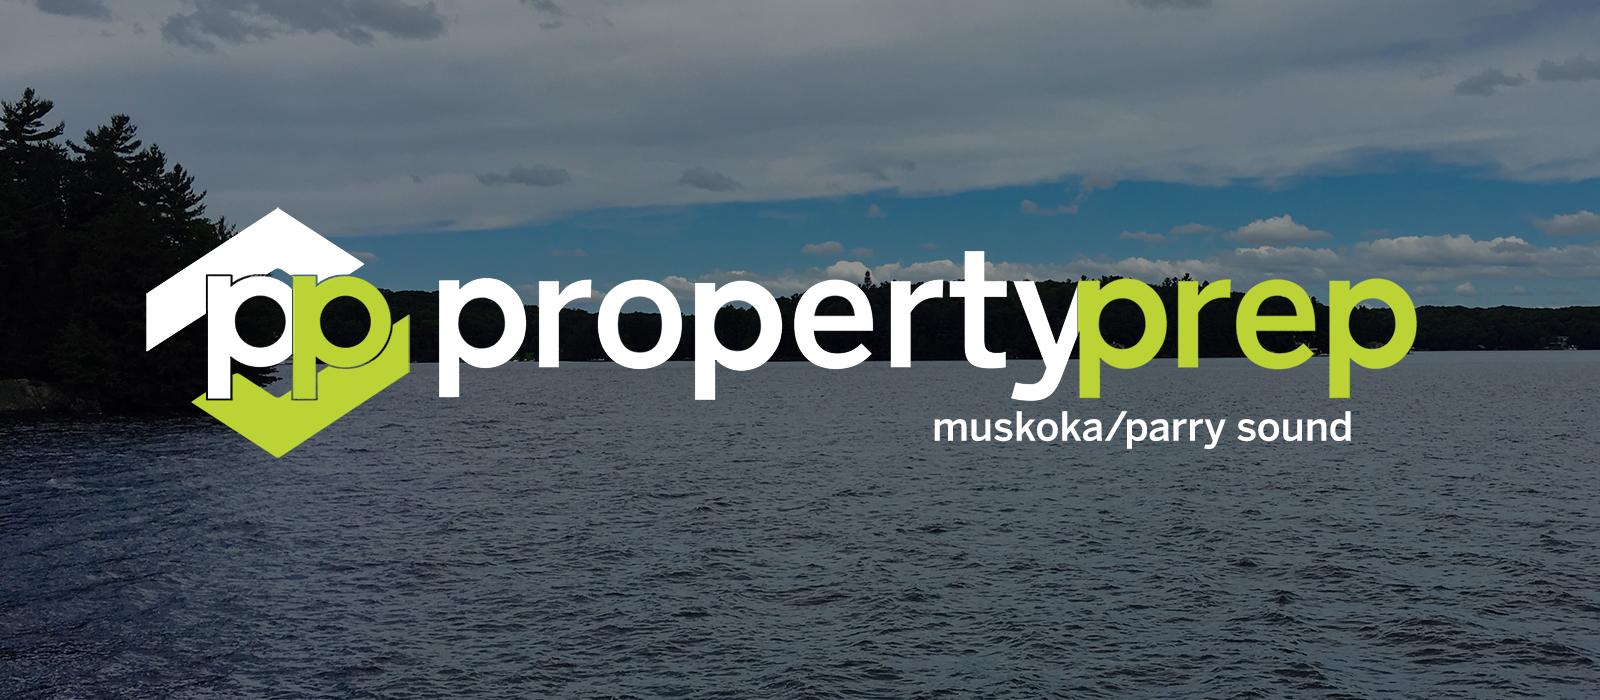 PP-CANADA-MUSKOKA-PARRY-SOUND